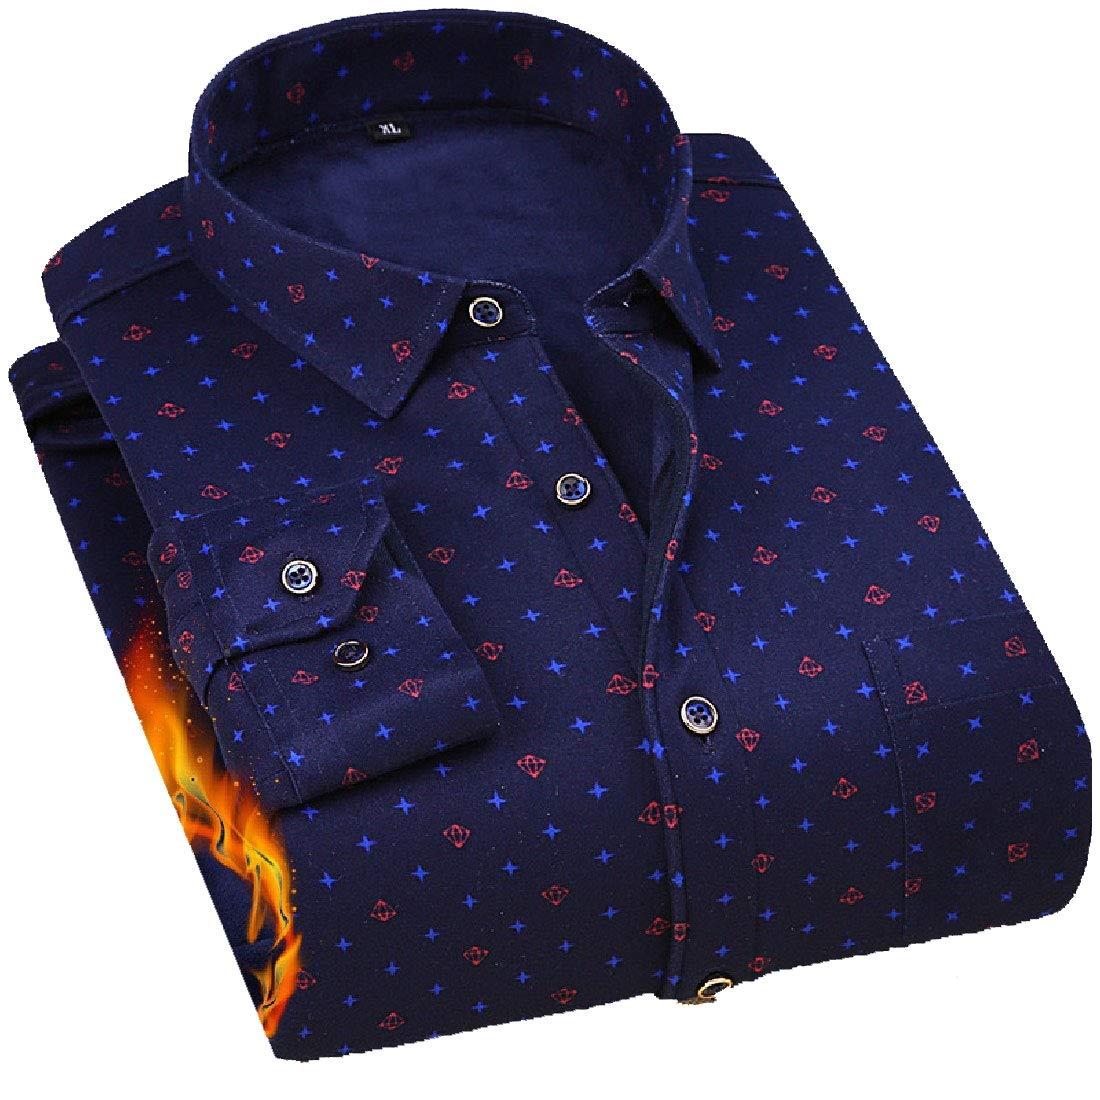 YUNY Men Leisure Warm Long Sleeve Button Turn-Down Collar Work Shirt AS13 2XL